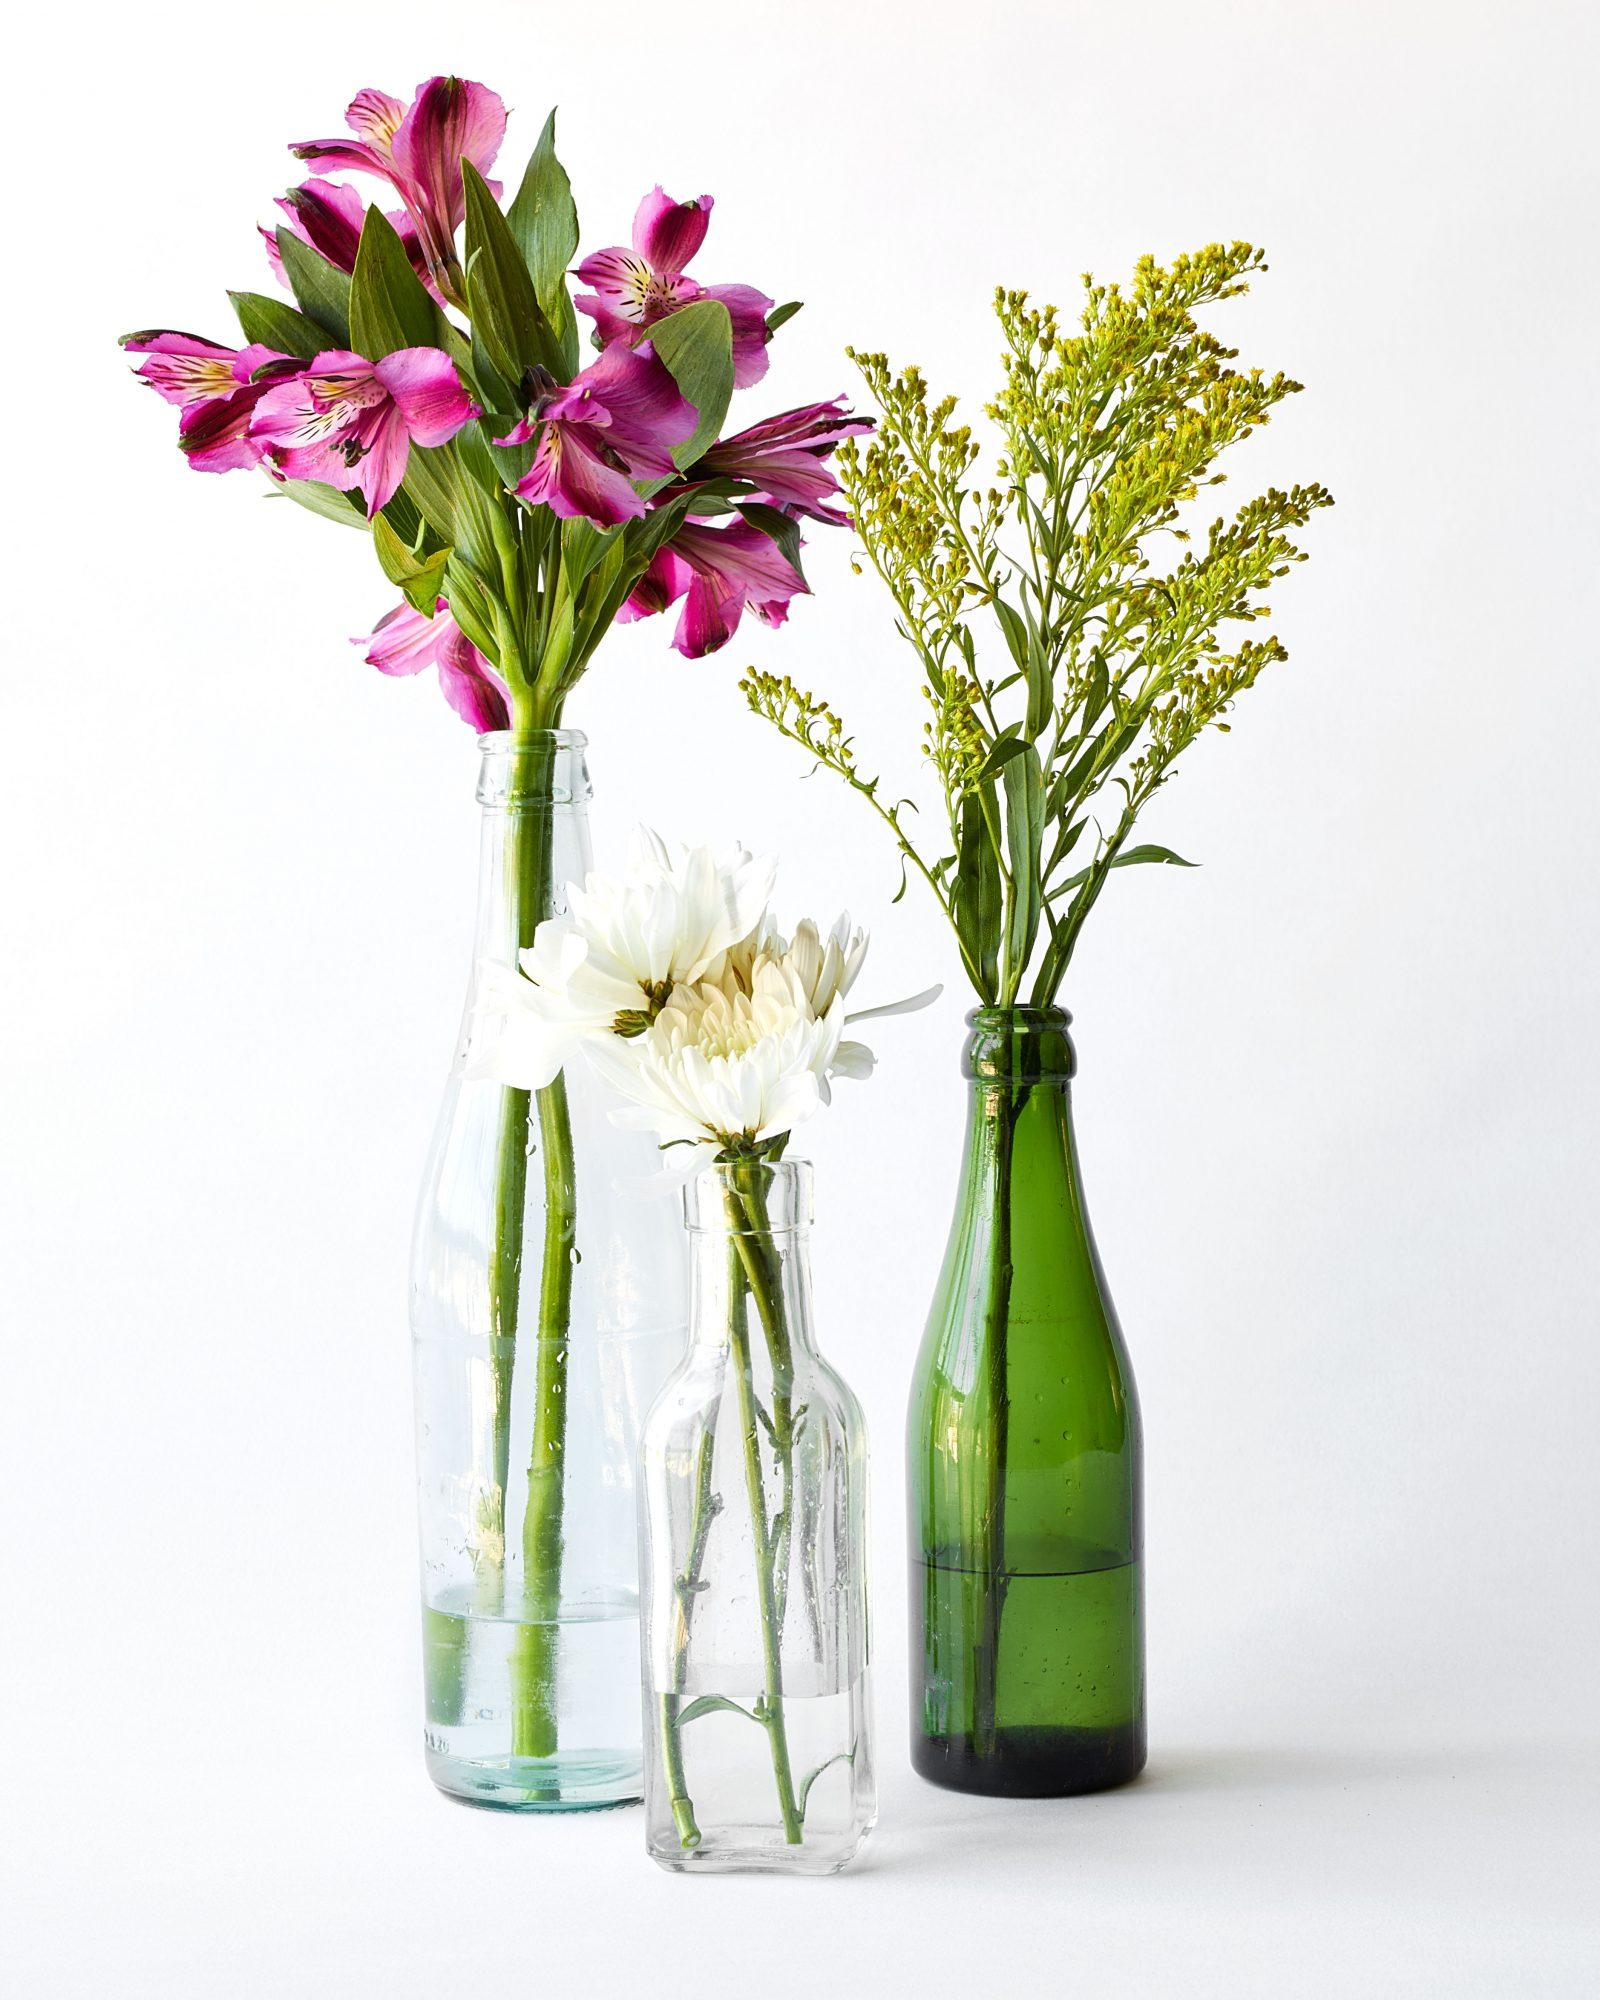 upcycle vases